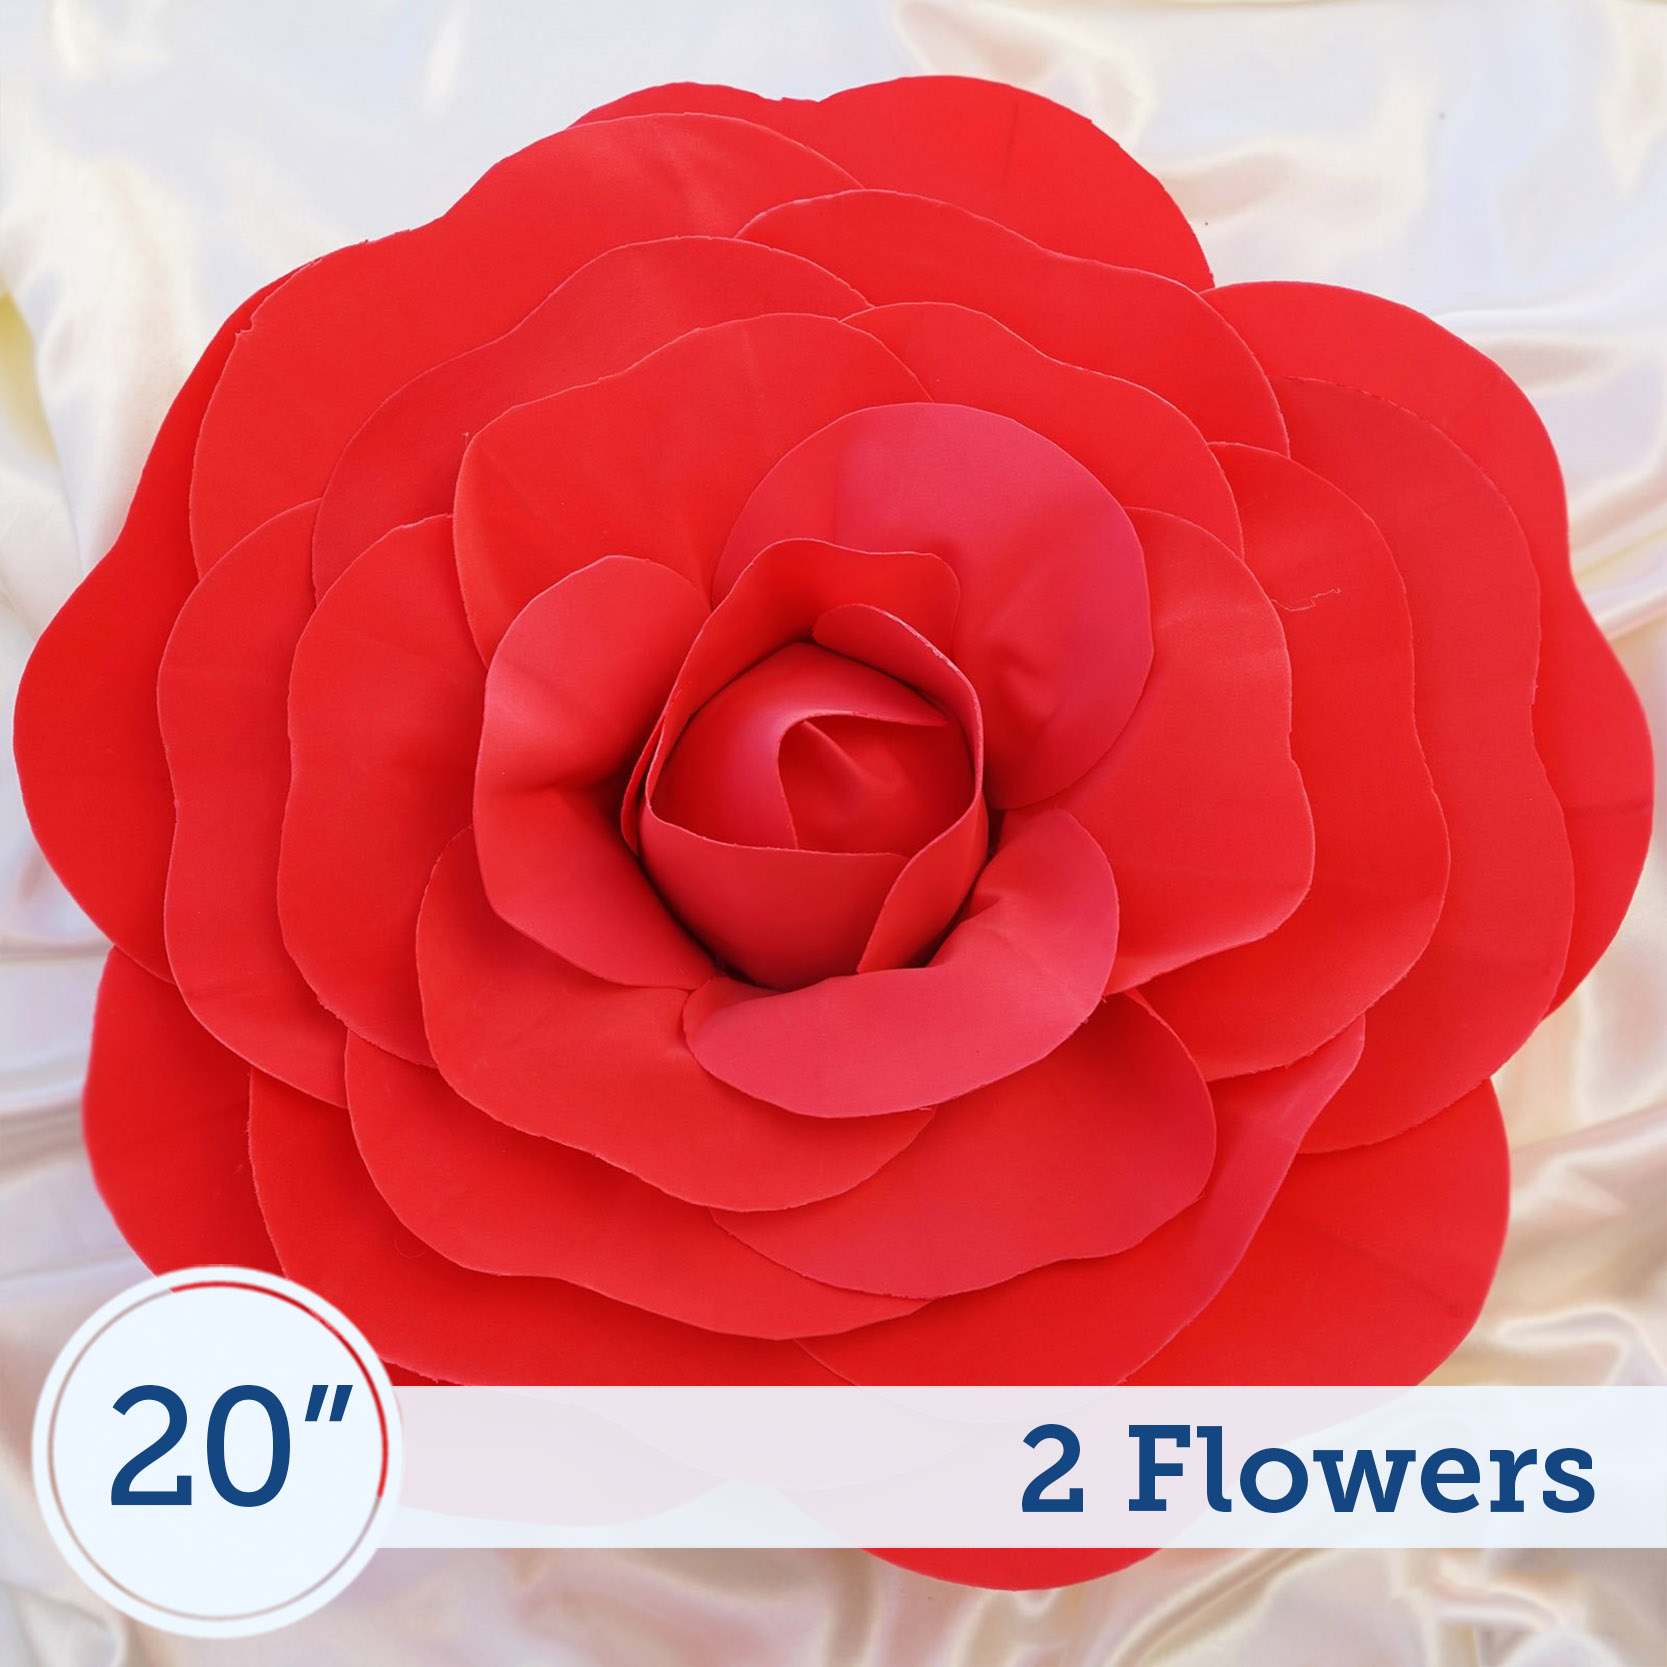 "BalsaCircle 2 pcs 20"" wide Artificial Large Roses Flowers Wall Backdrop - DIY Home Wedding Party Bouquets Arrangements Centerpieces"